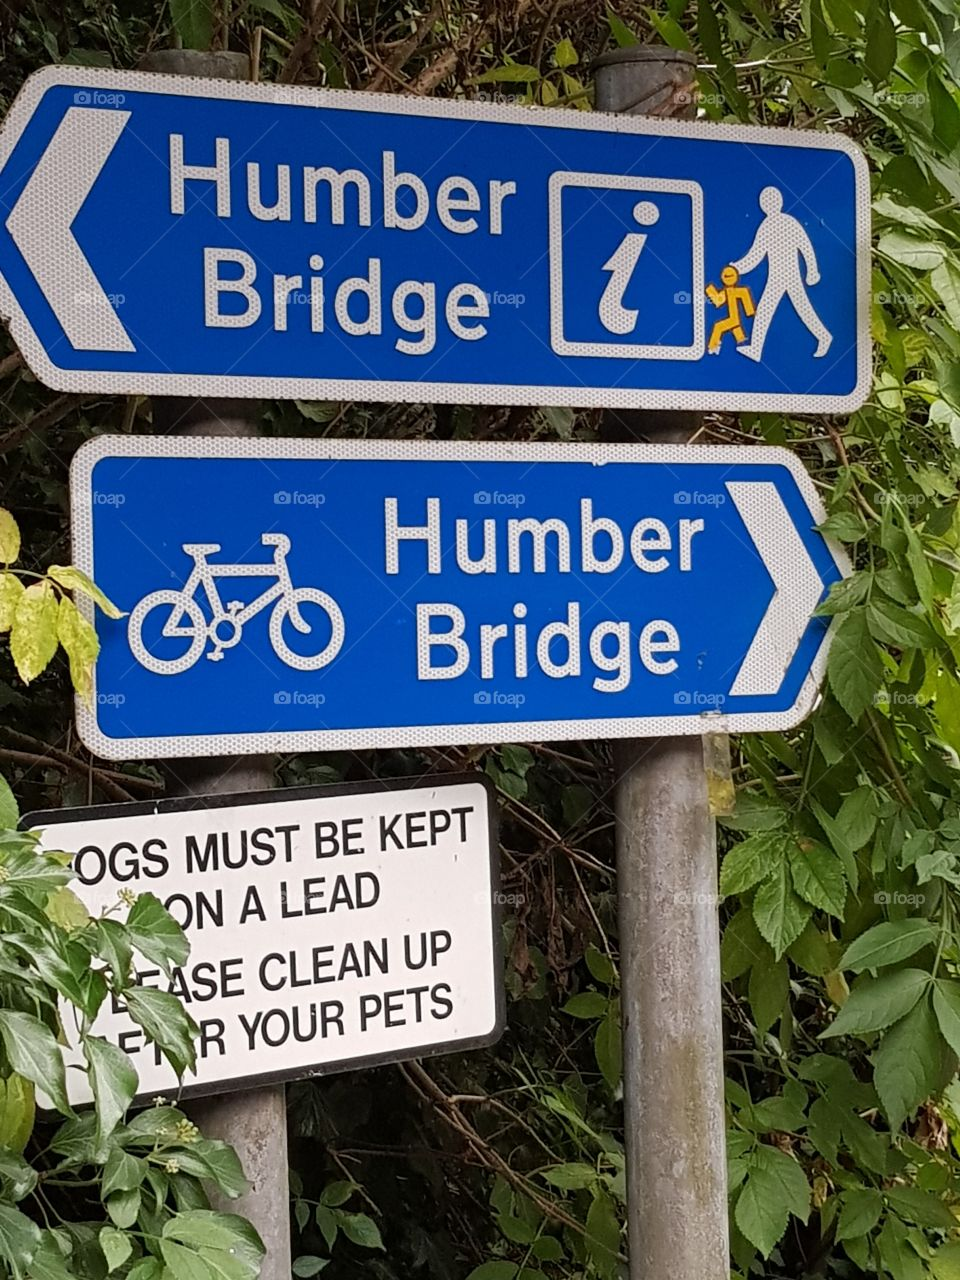 Humber Bridge sign